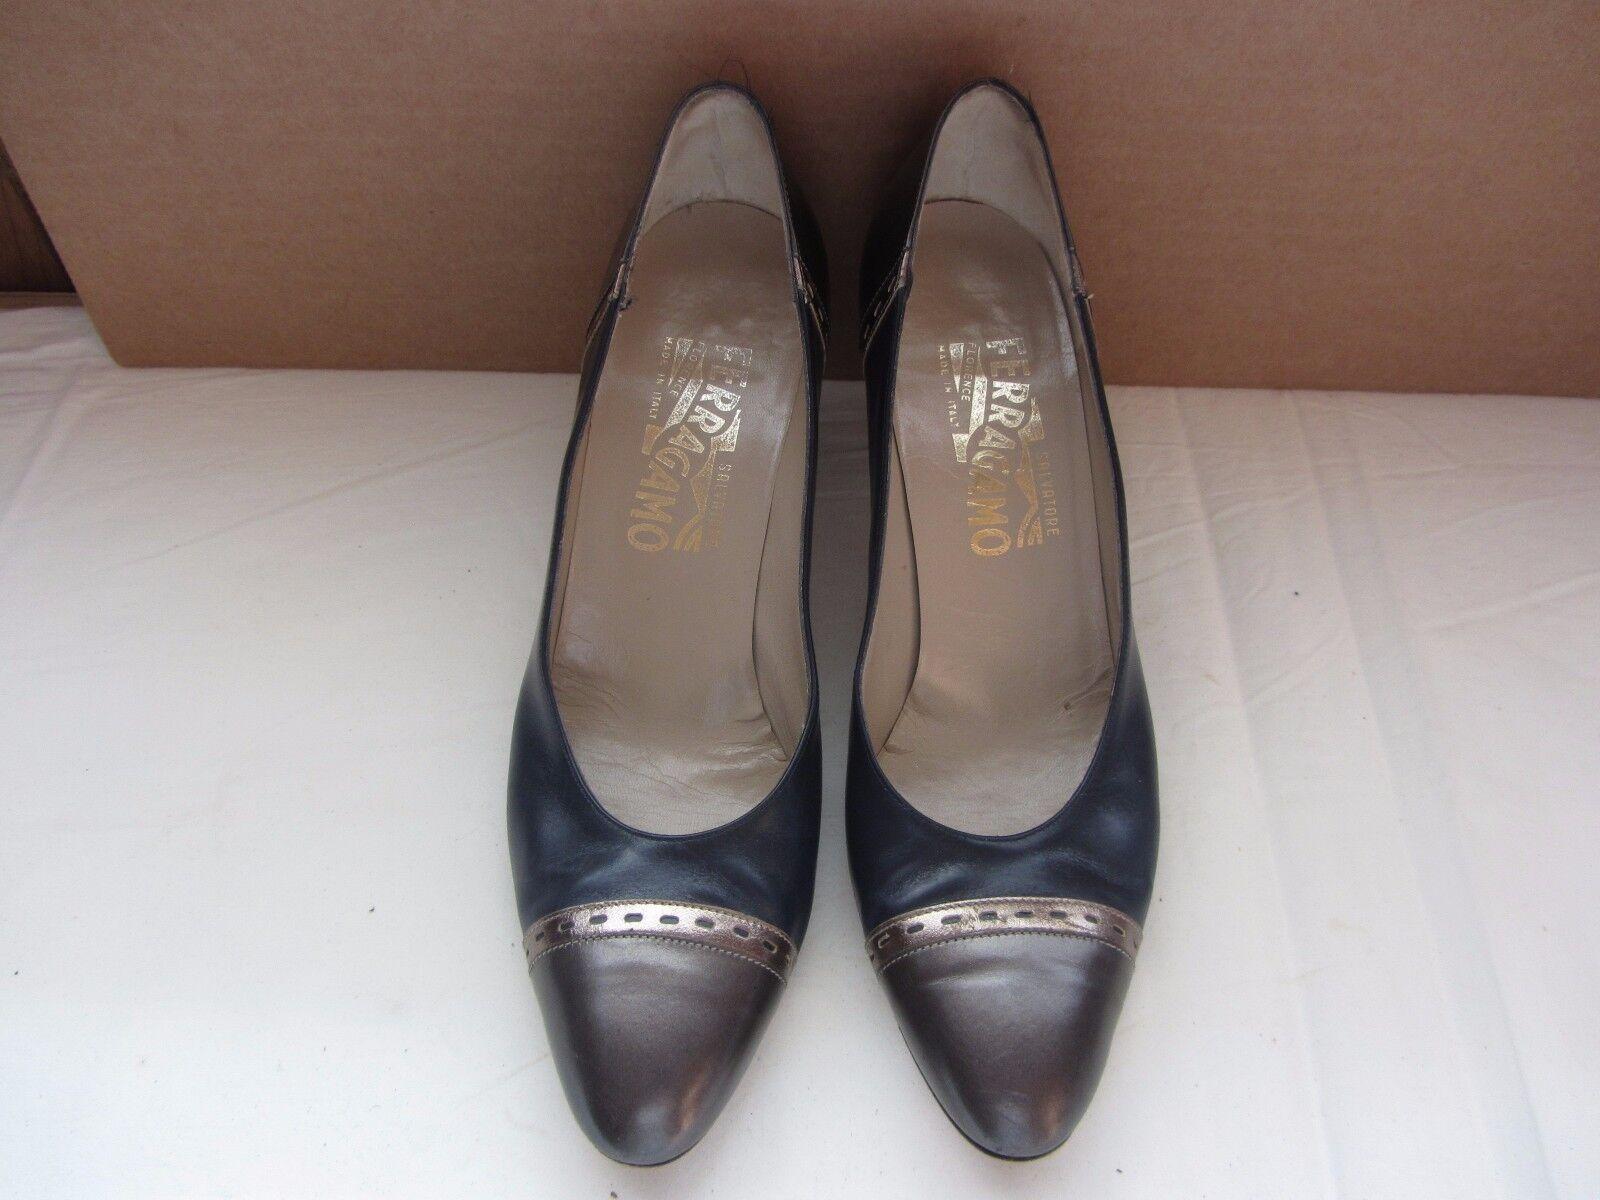 Women's Salvatore Ferragamo  Classic Pumps Shoes Size 8 AA